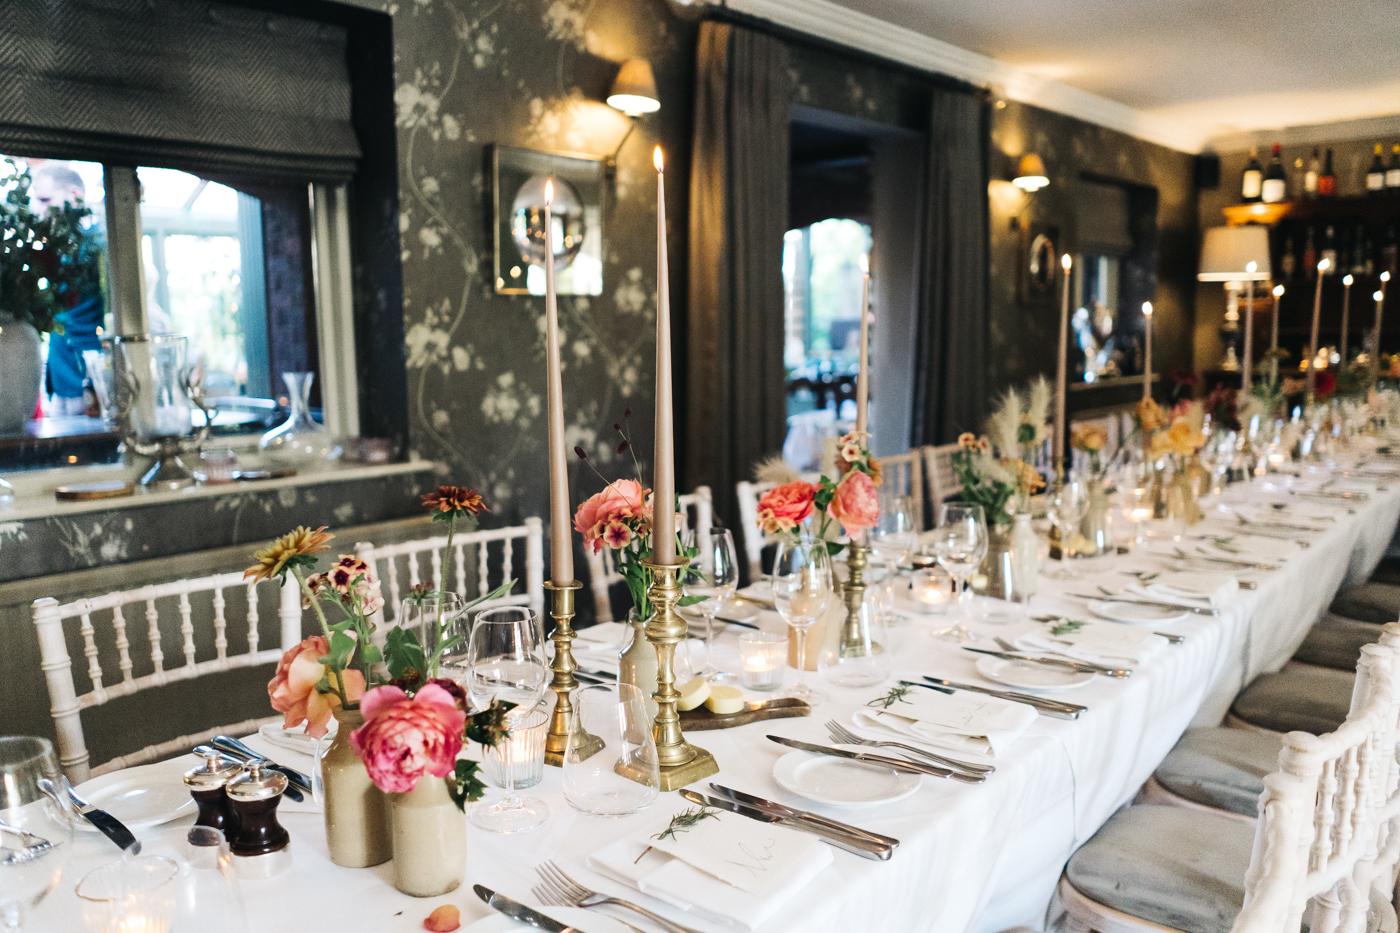 wedding-at-the-pheasant-harome-helmsley-north-yorkshire-wedding-photographer-0032.jpg